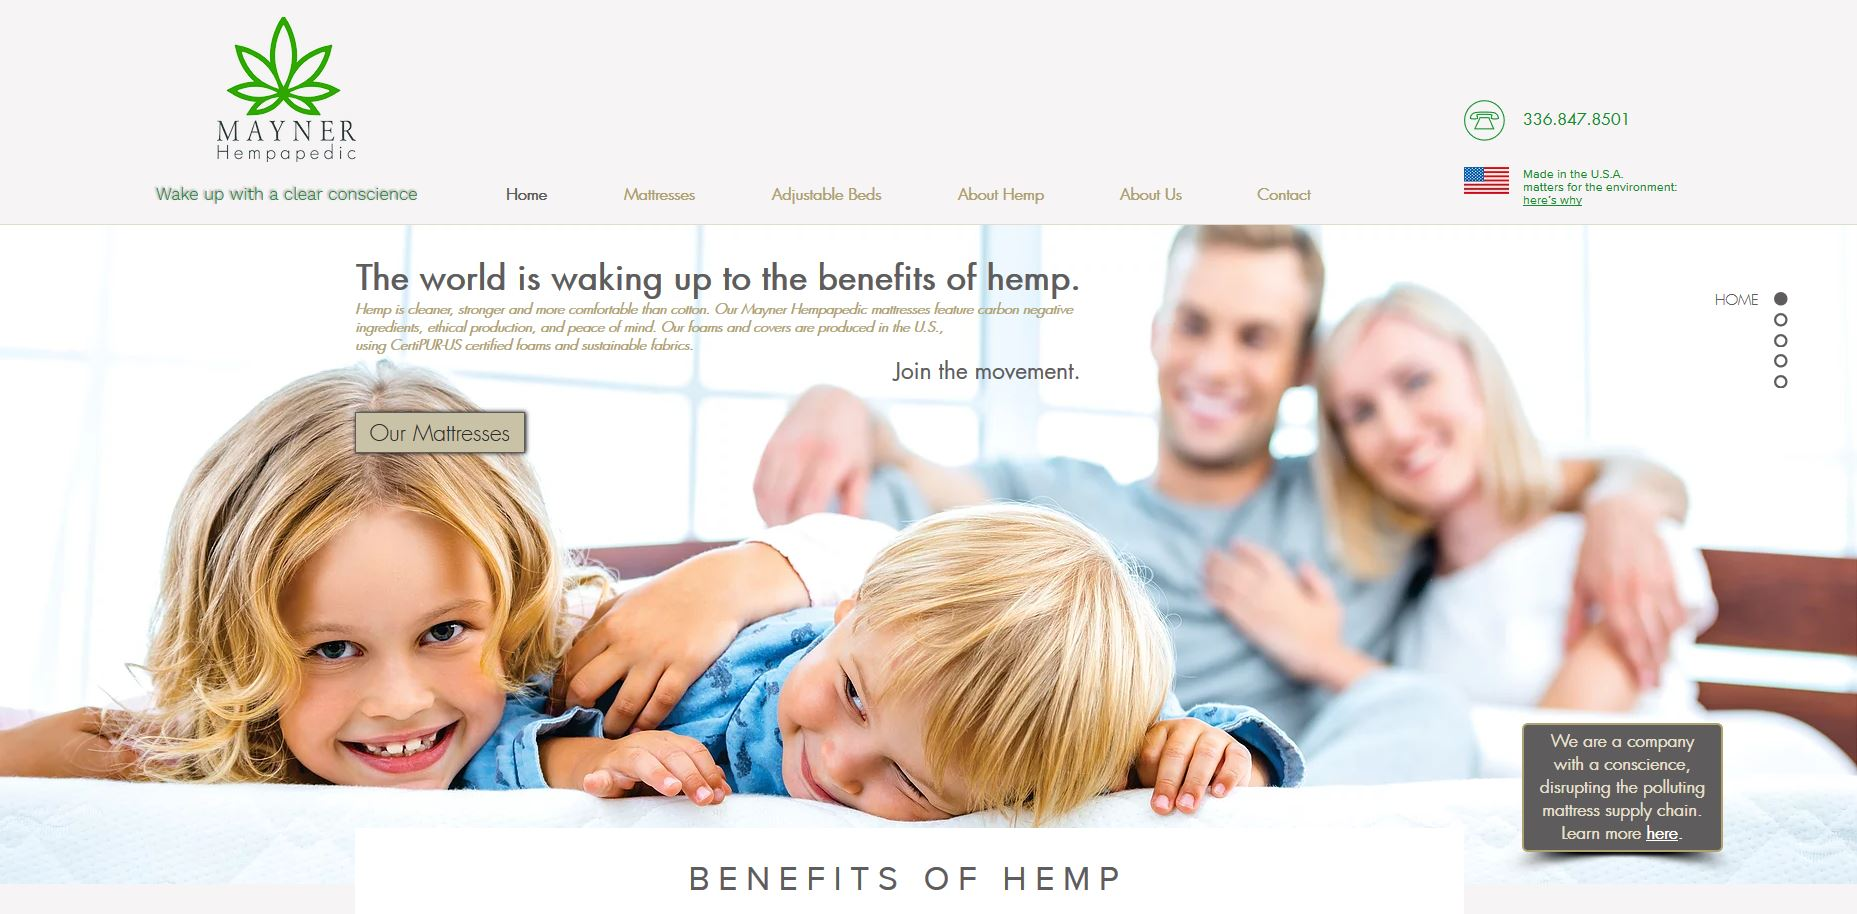 Mayner Hempapedic Website